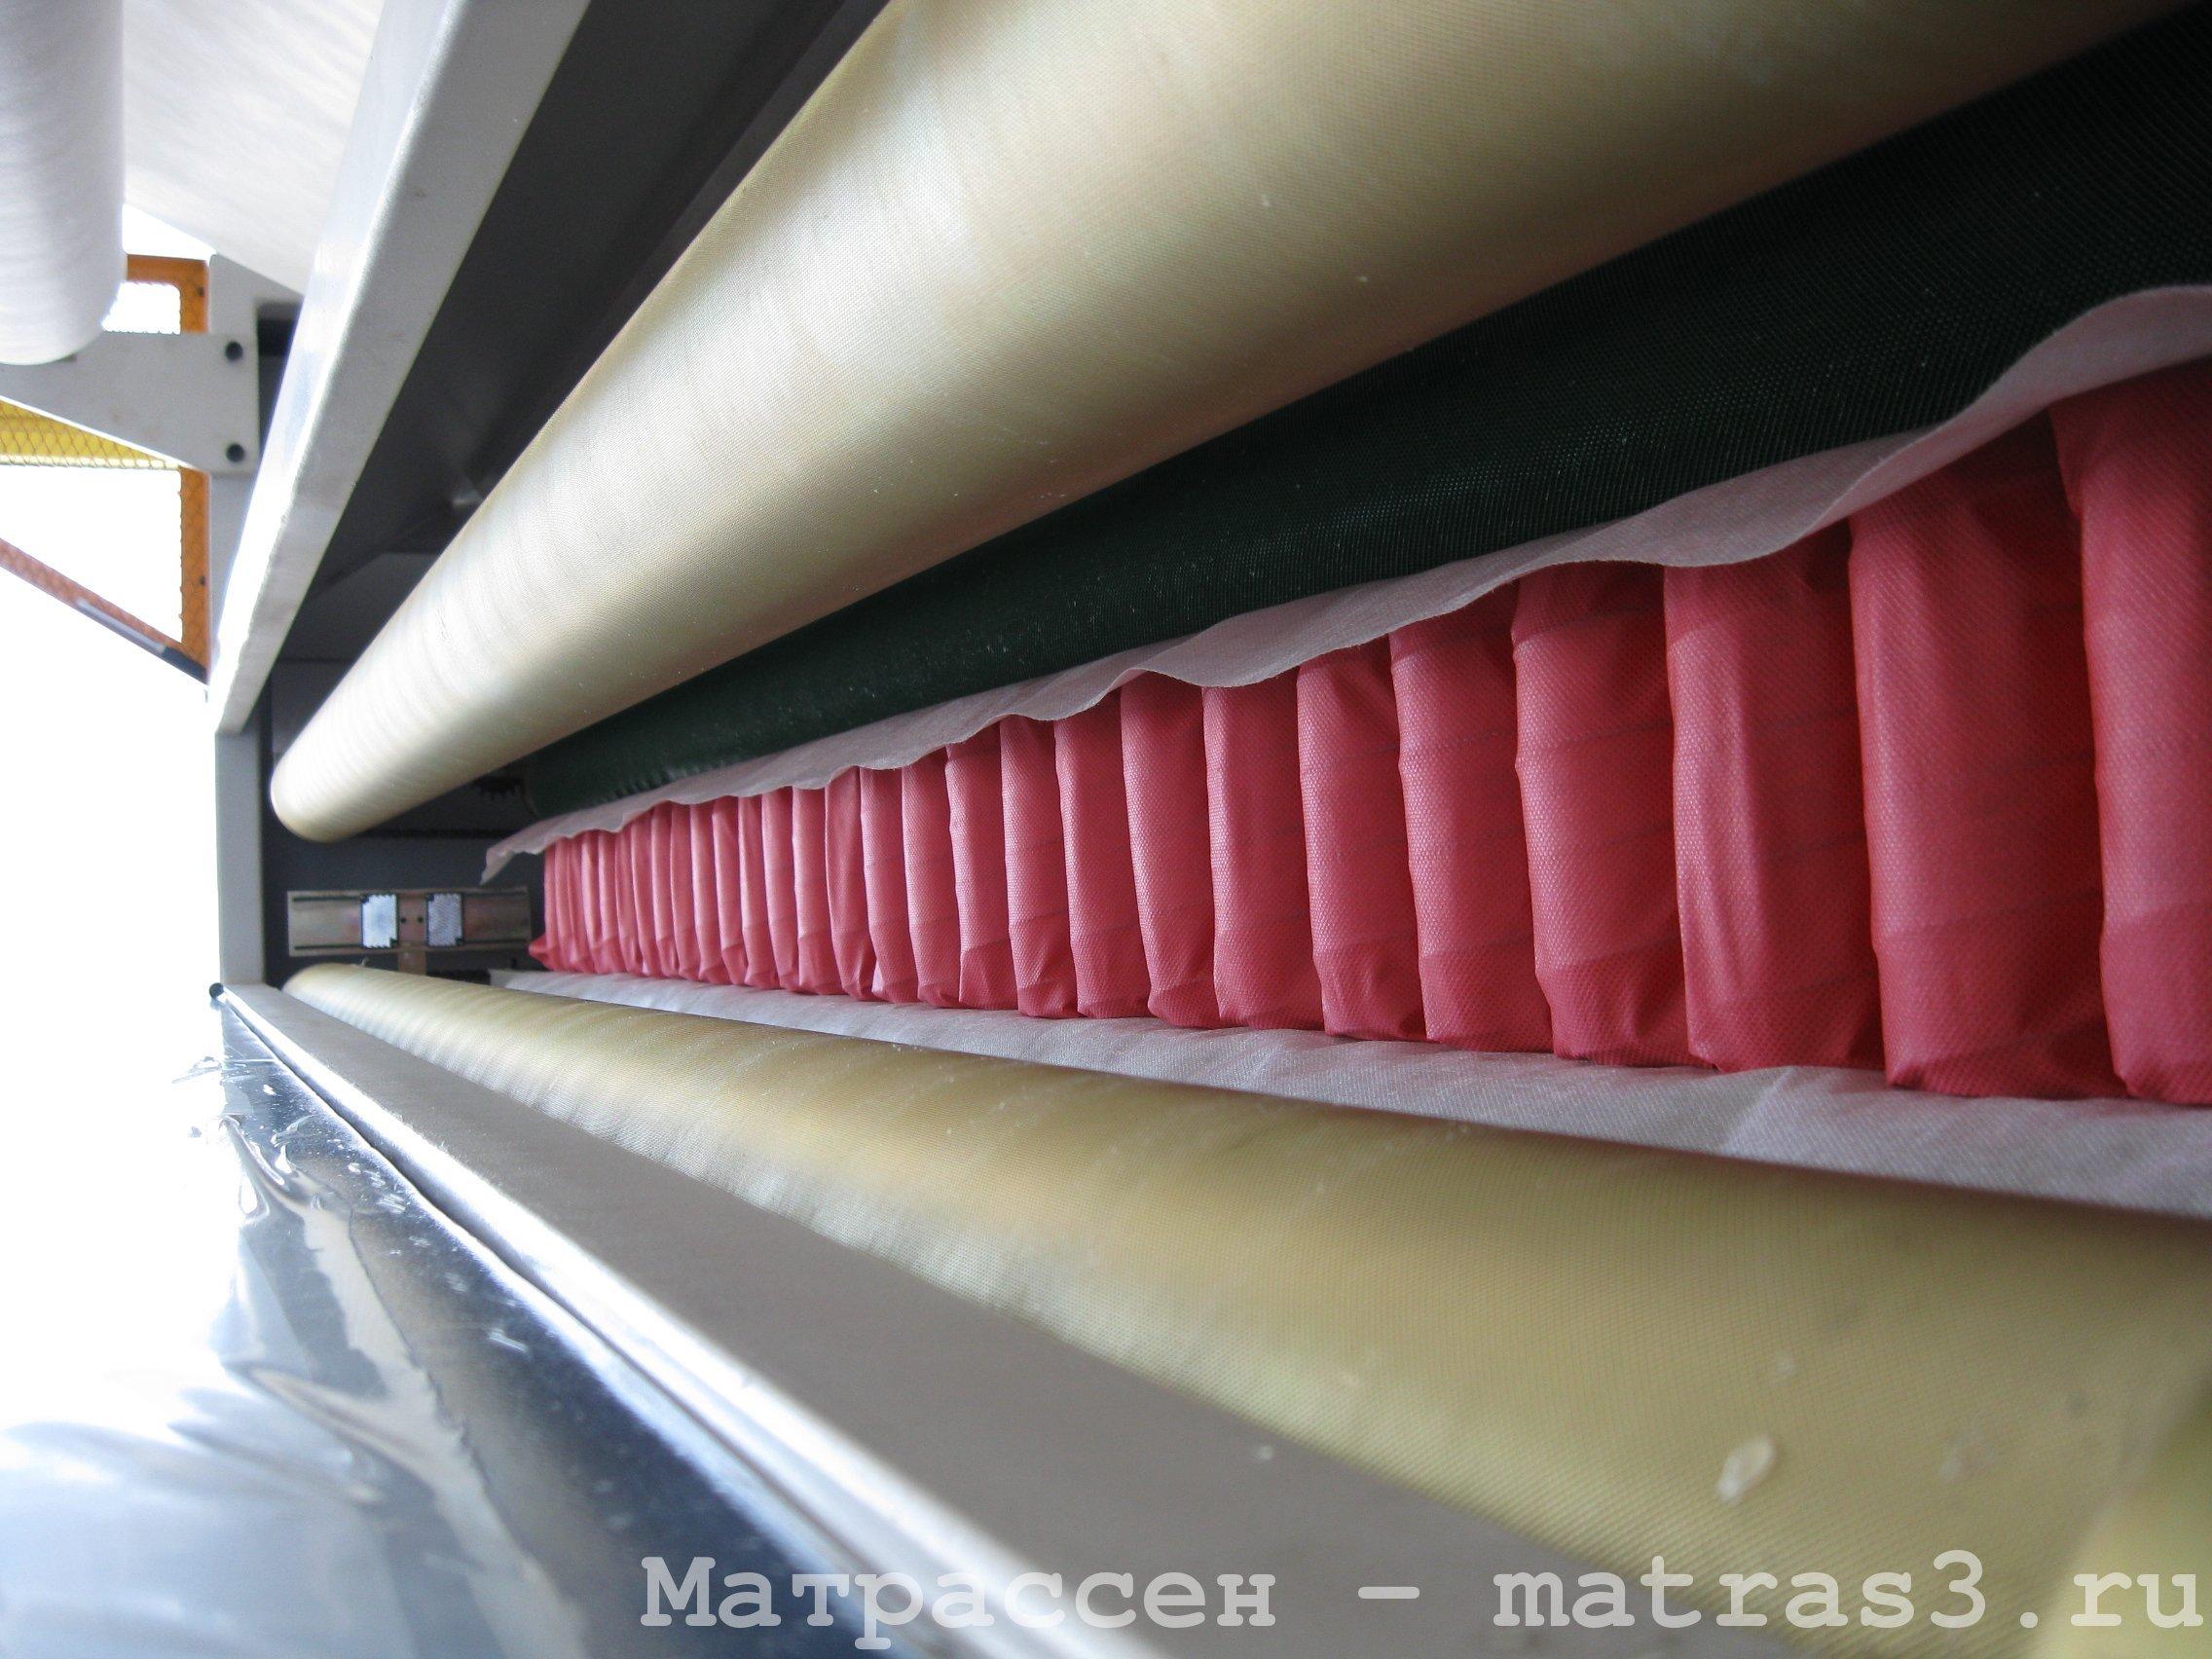 http://matras3.ru/images/upload/watermarked%20-%20IMG_0208.JPG